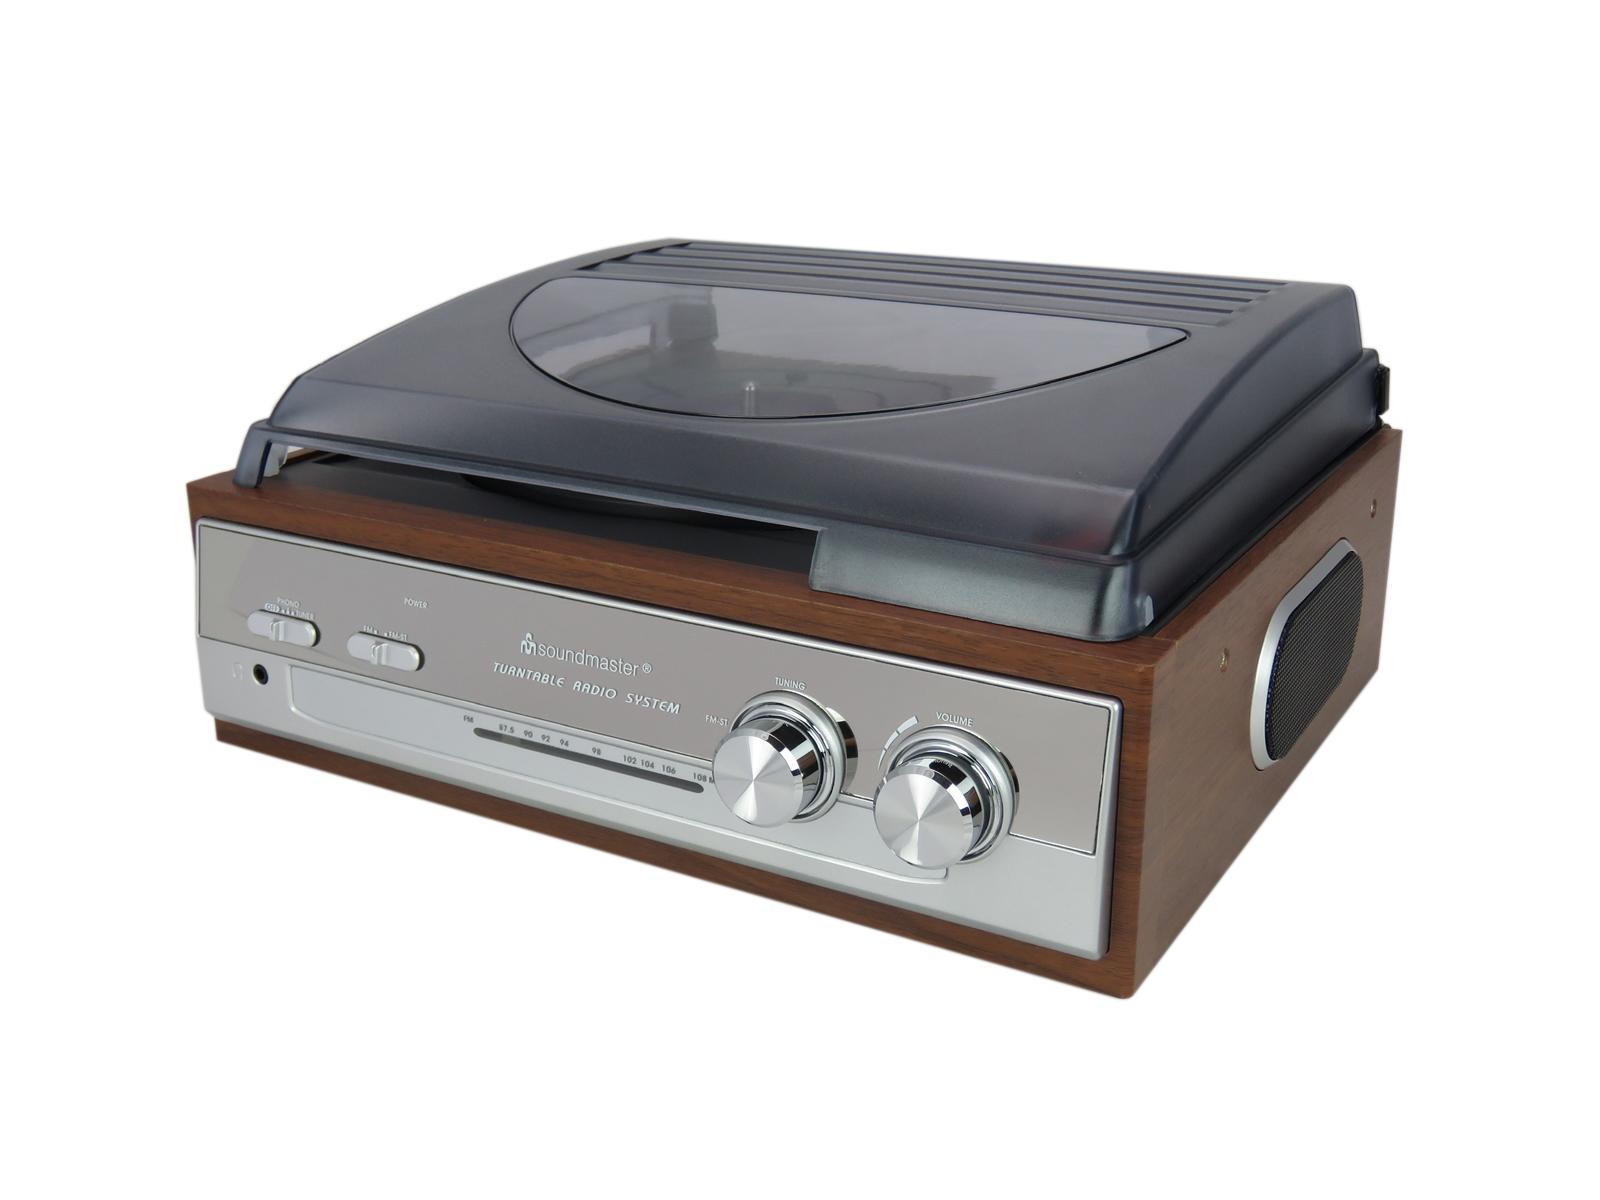 Buy Soundmaster Pl186h Retro Fm Radio Record Player Turntable